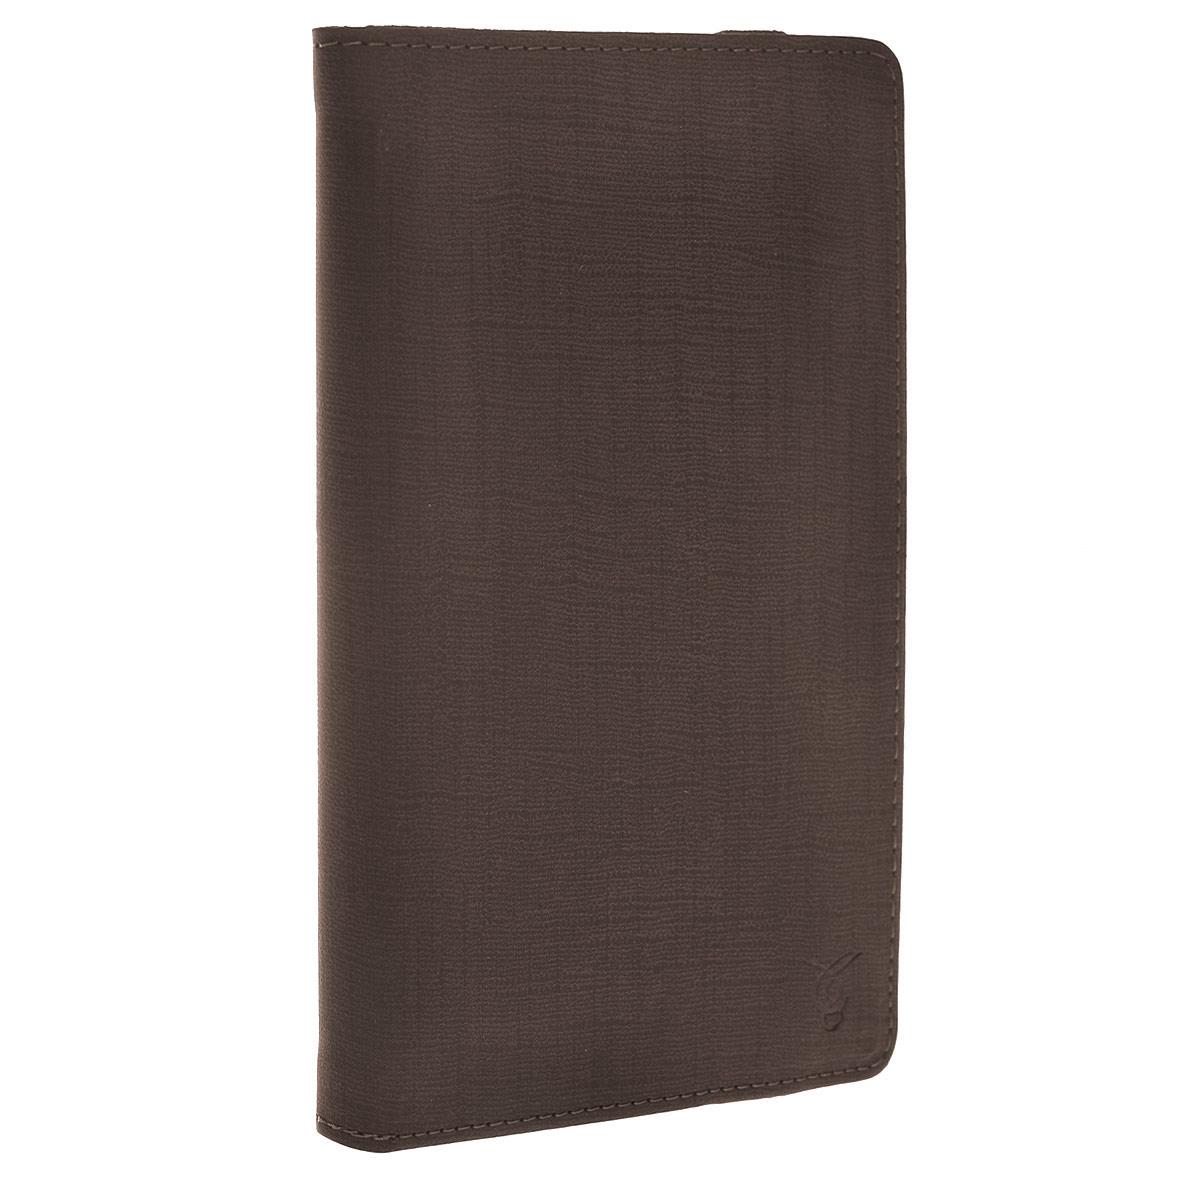 "Vivacase Viva Chocolate чехол для планшетов 7"", Brown (VUC-CCH07-br)"